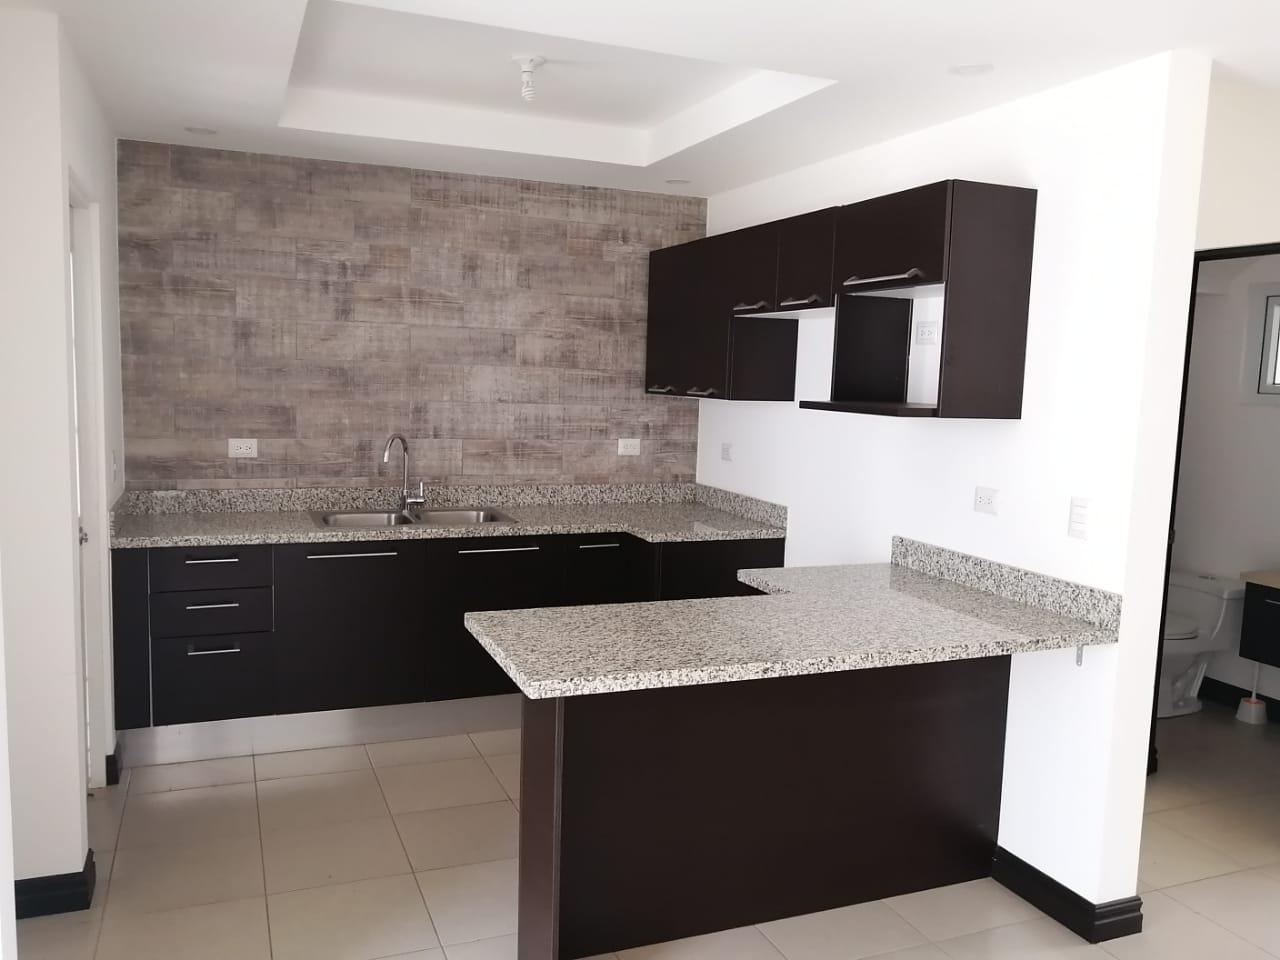 2260 Se Vende casa dentro de condominio en Guachipelin